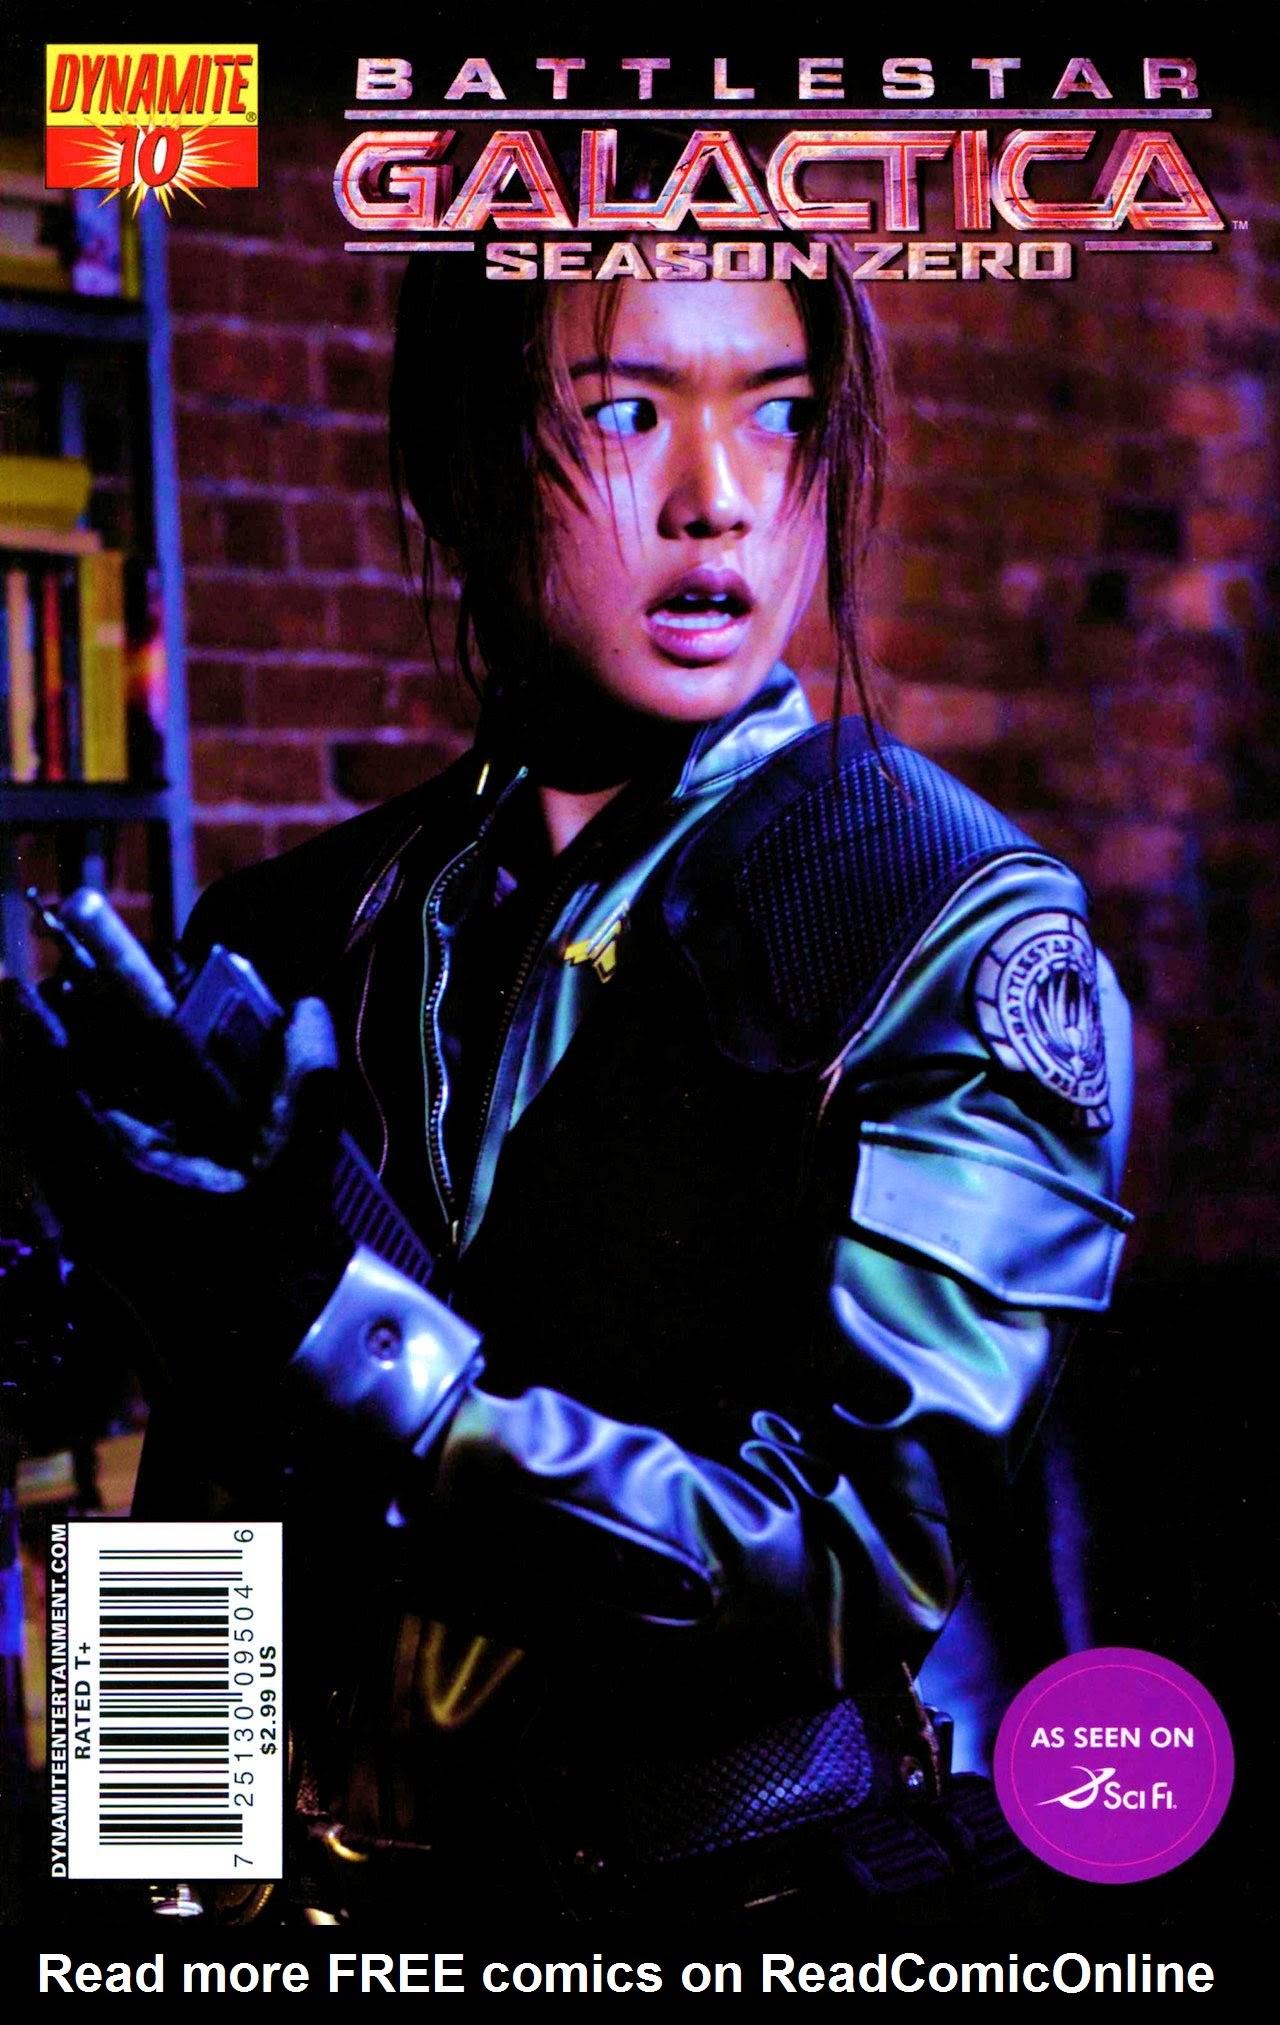 Battlestar Galactica: Season Zero 10 Page 1